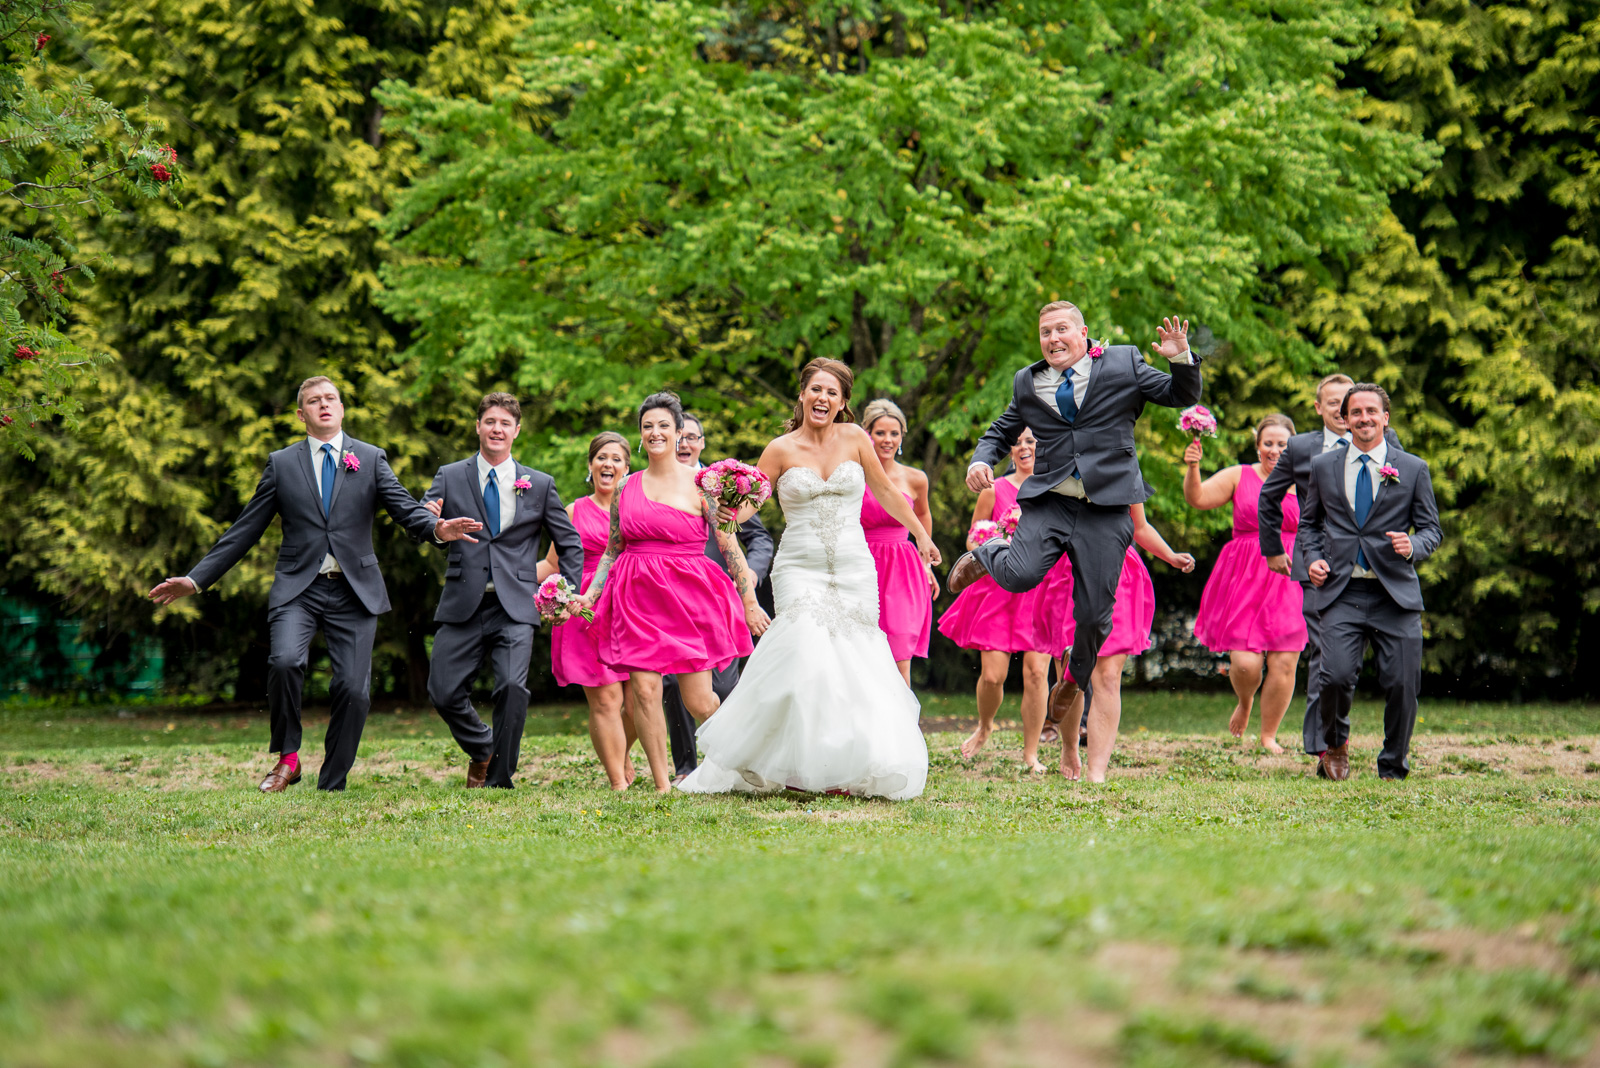 victoria-wedding-photographers-burnaby-mountain-wedding-burnaby-rowing-club-wedding-25.jpg